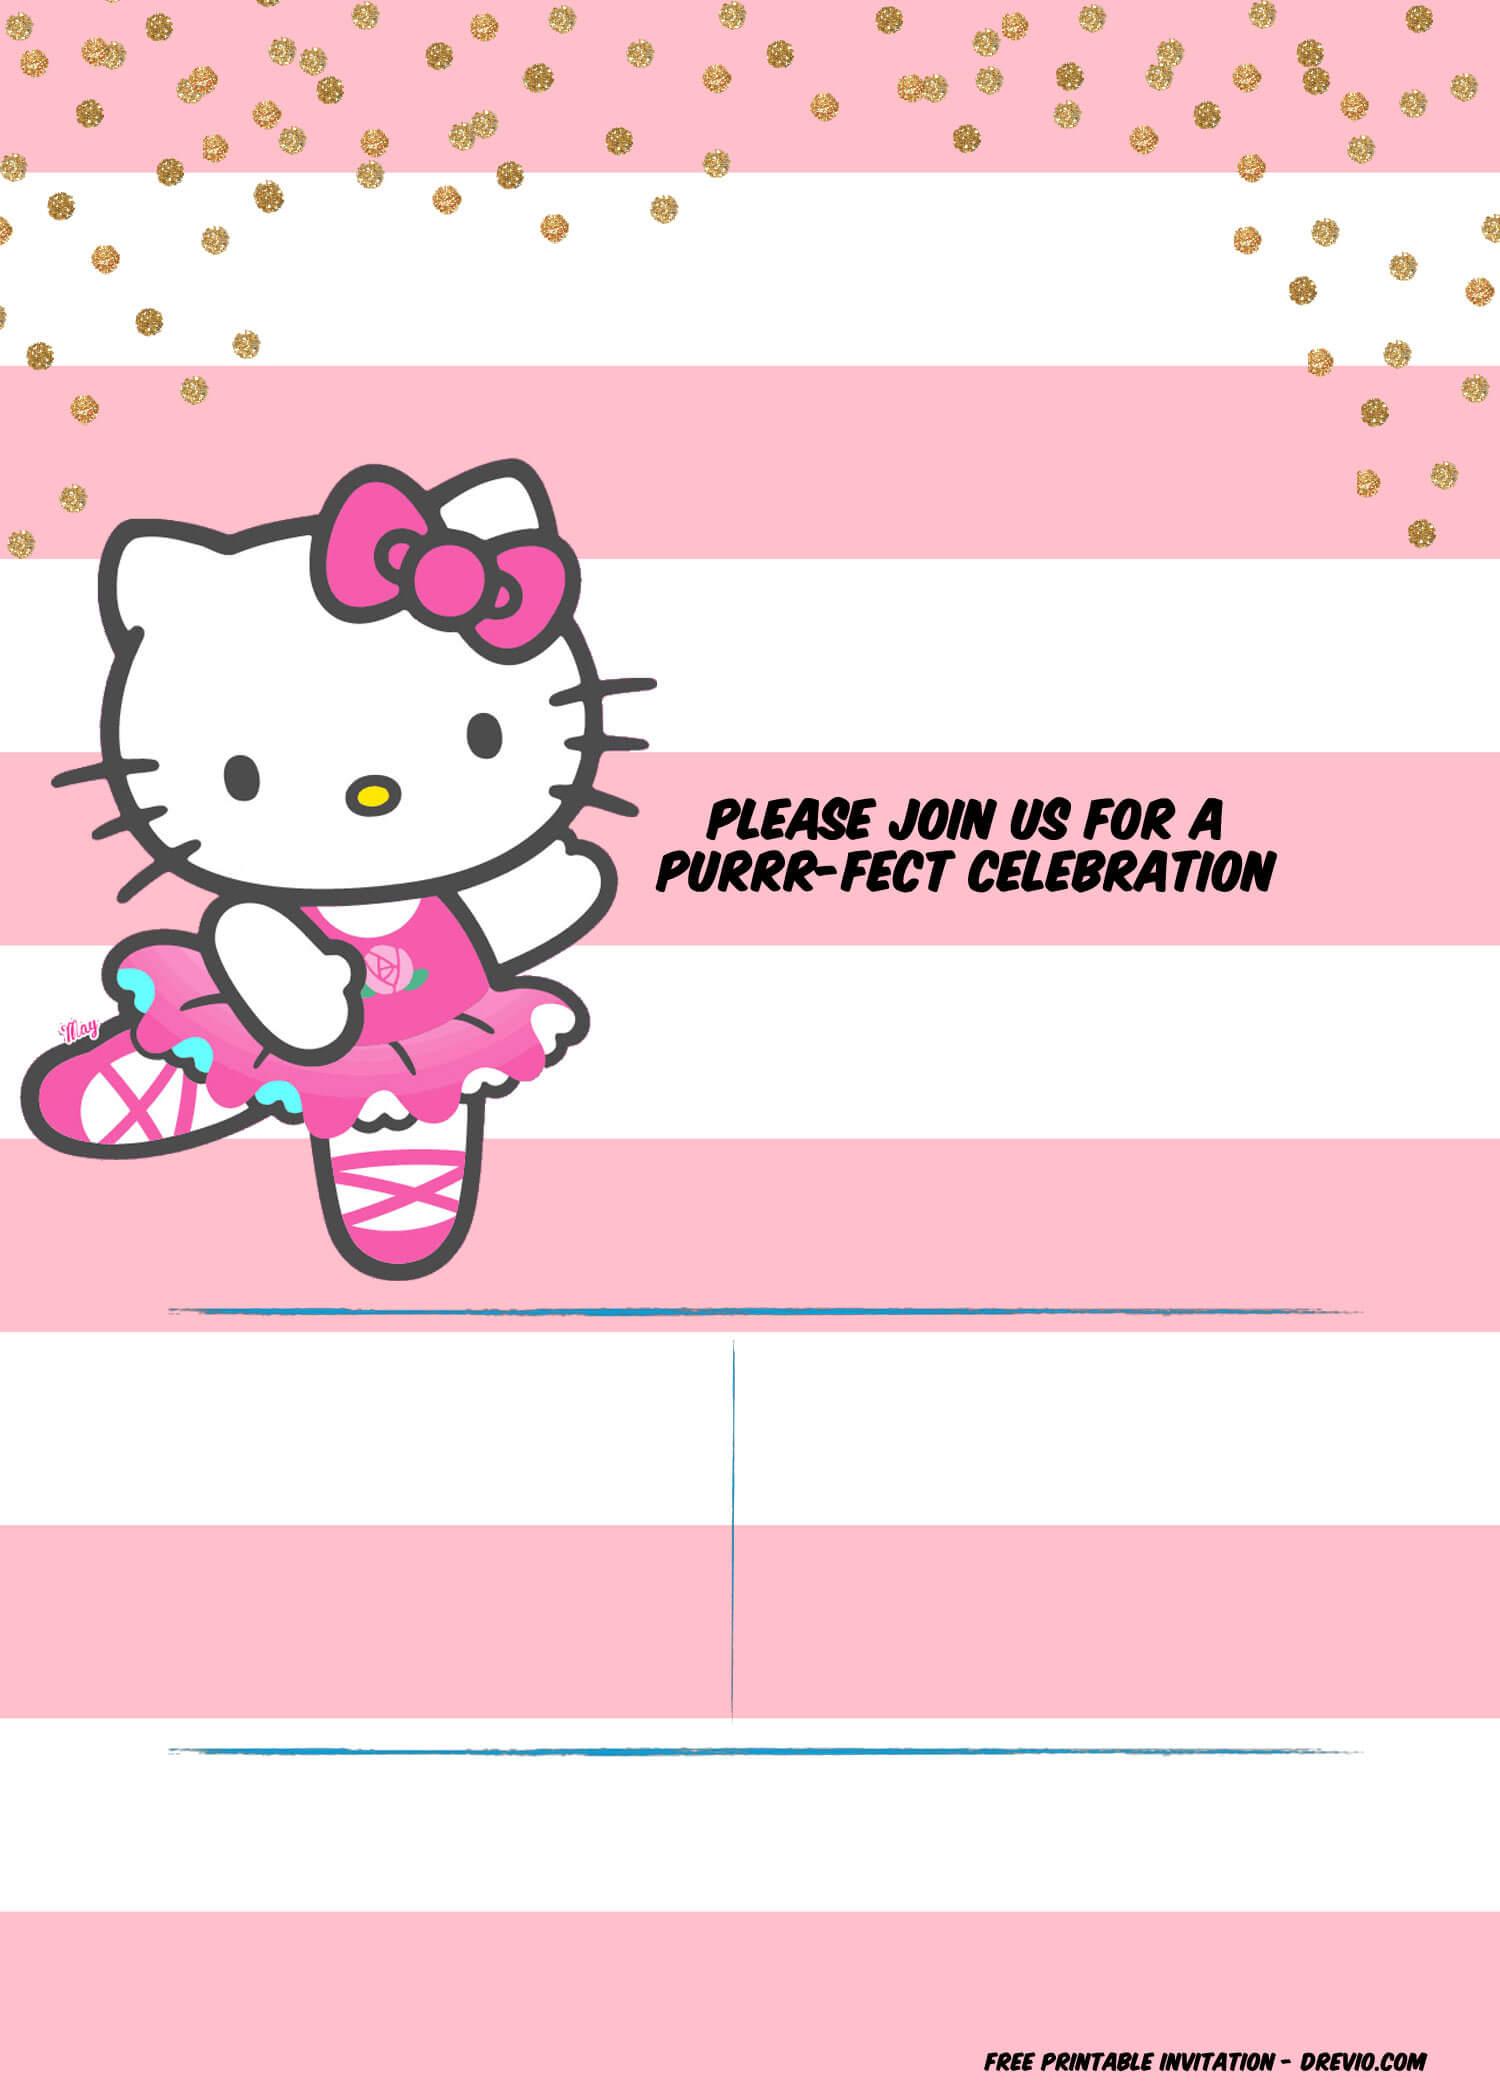 Hello Kitty Birthday Party Ideas - Invitations, Dress Throughout Hello Kitty Birthday Banner Template Free